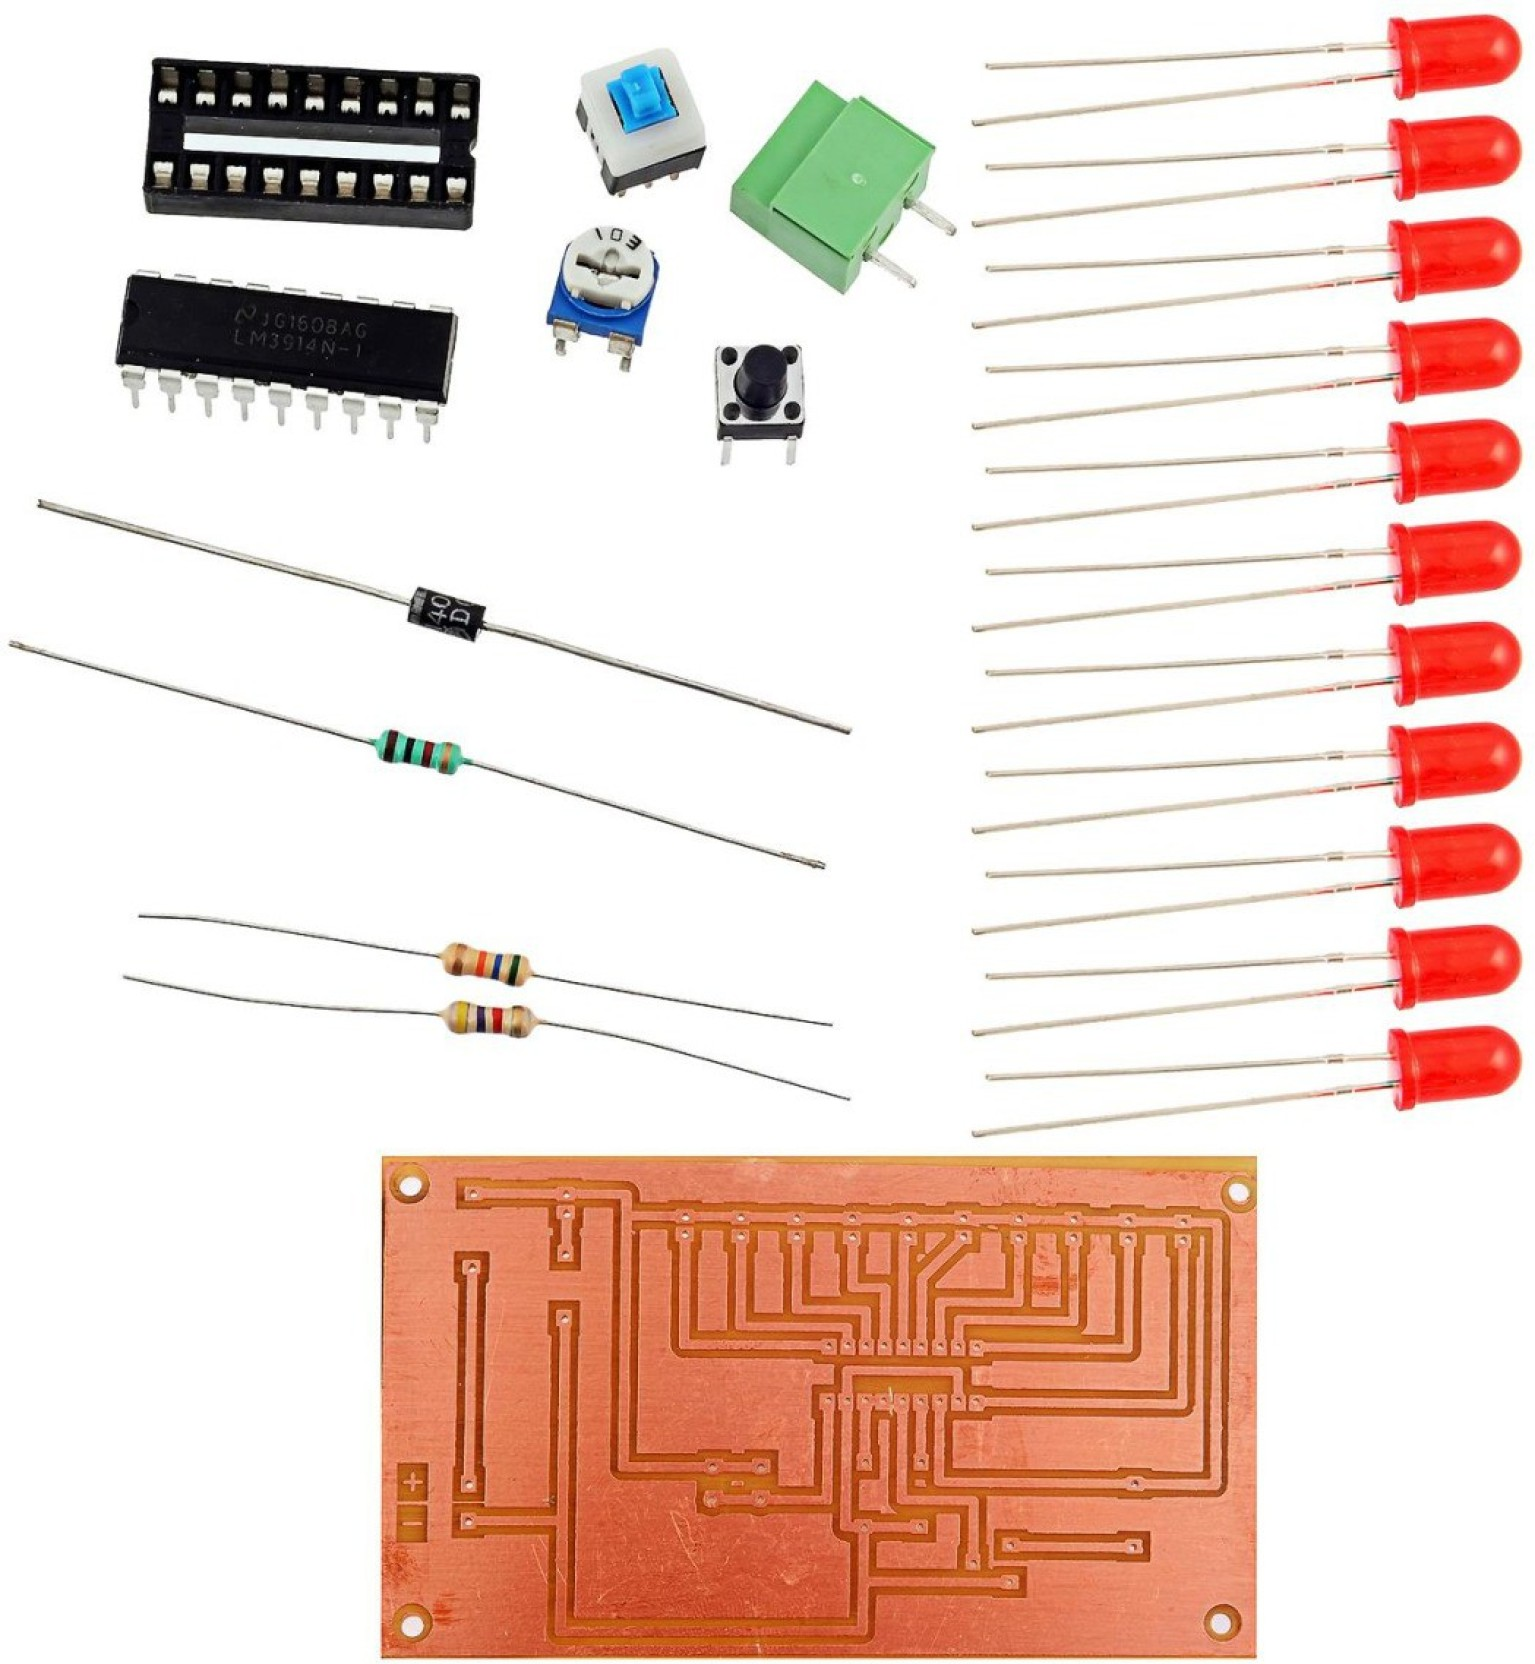 Kitsguru Battery Level Indicator Lgkt059 Educational Electronic Circuit Led Bar Ic Lm3914 Picture Of Good Add To Cart